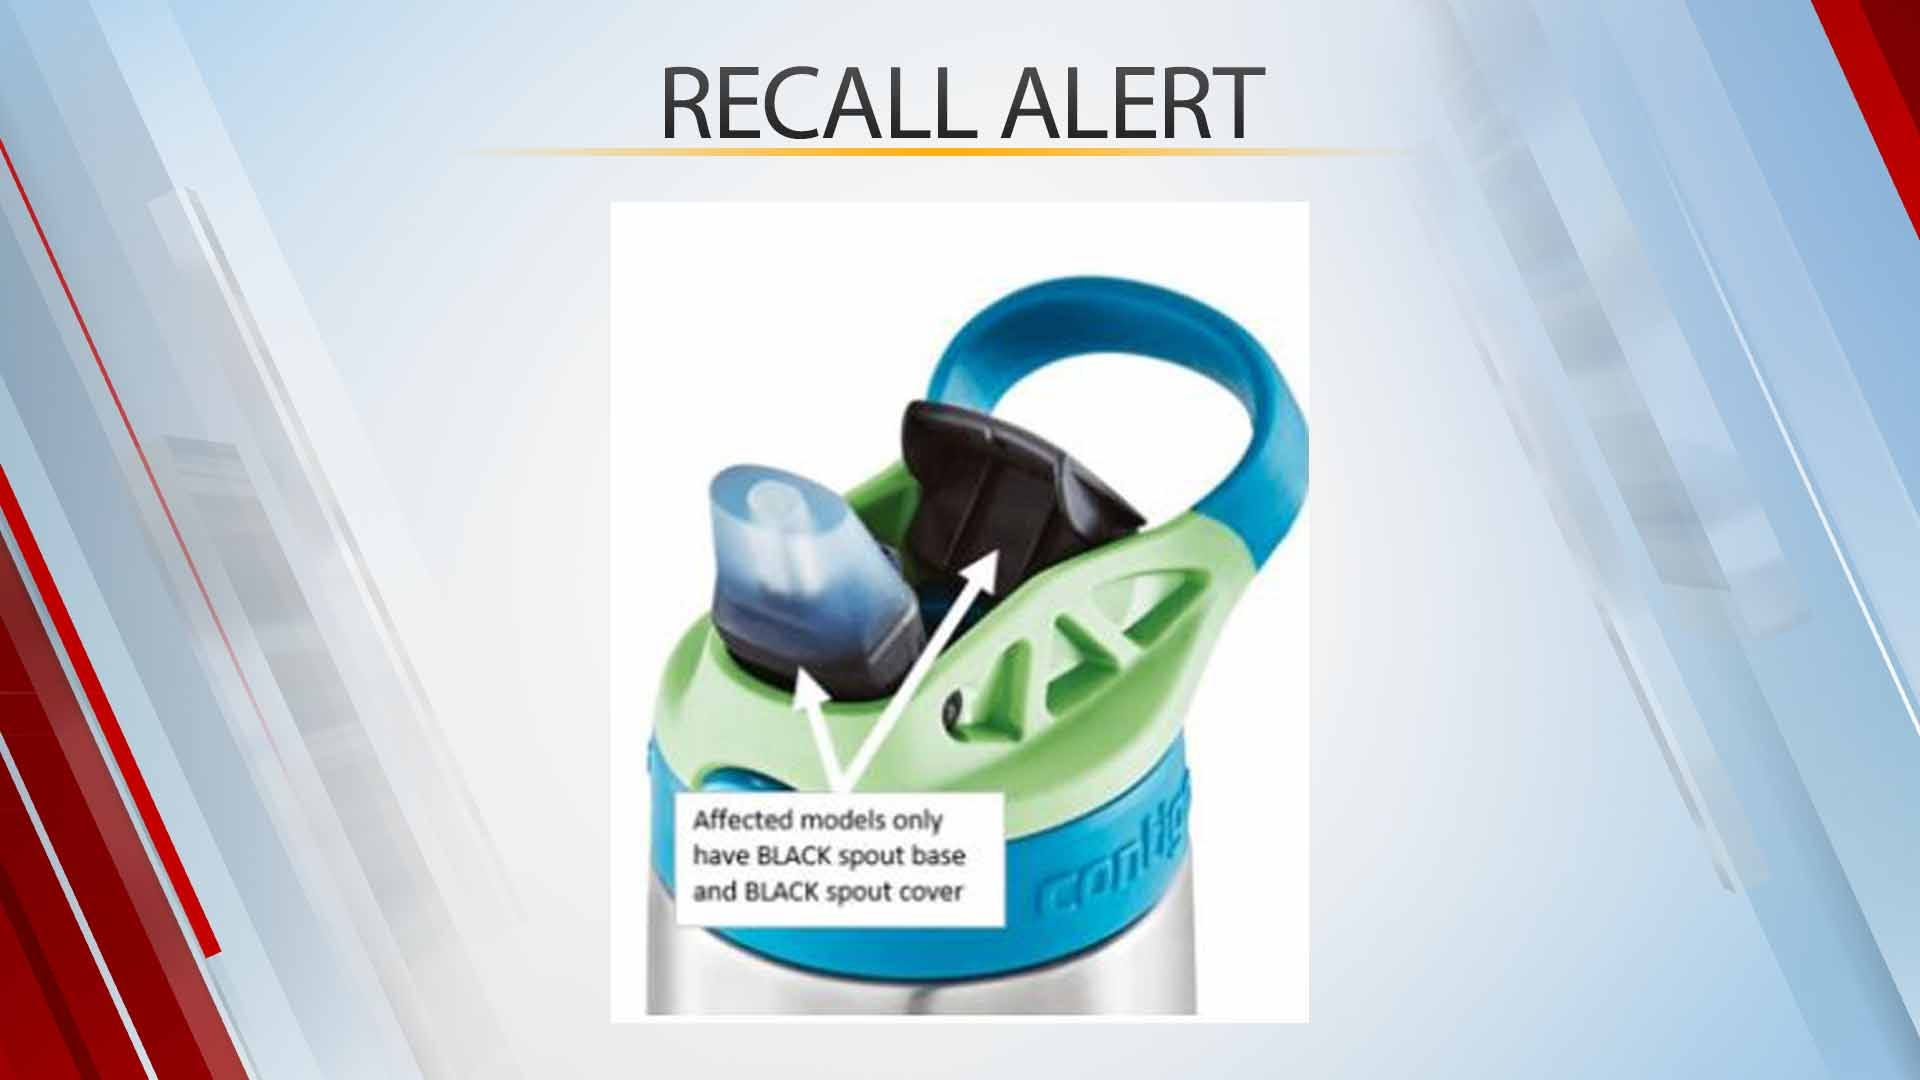 Contigo Recalls Nearly 6 Million Kids' Water Bottles Due To Choking Risk